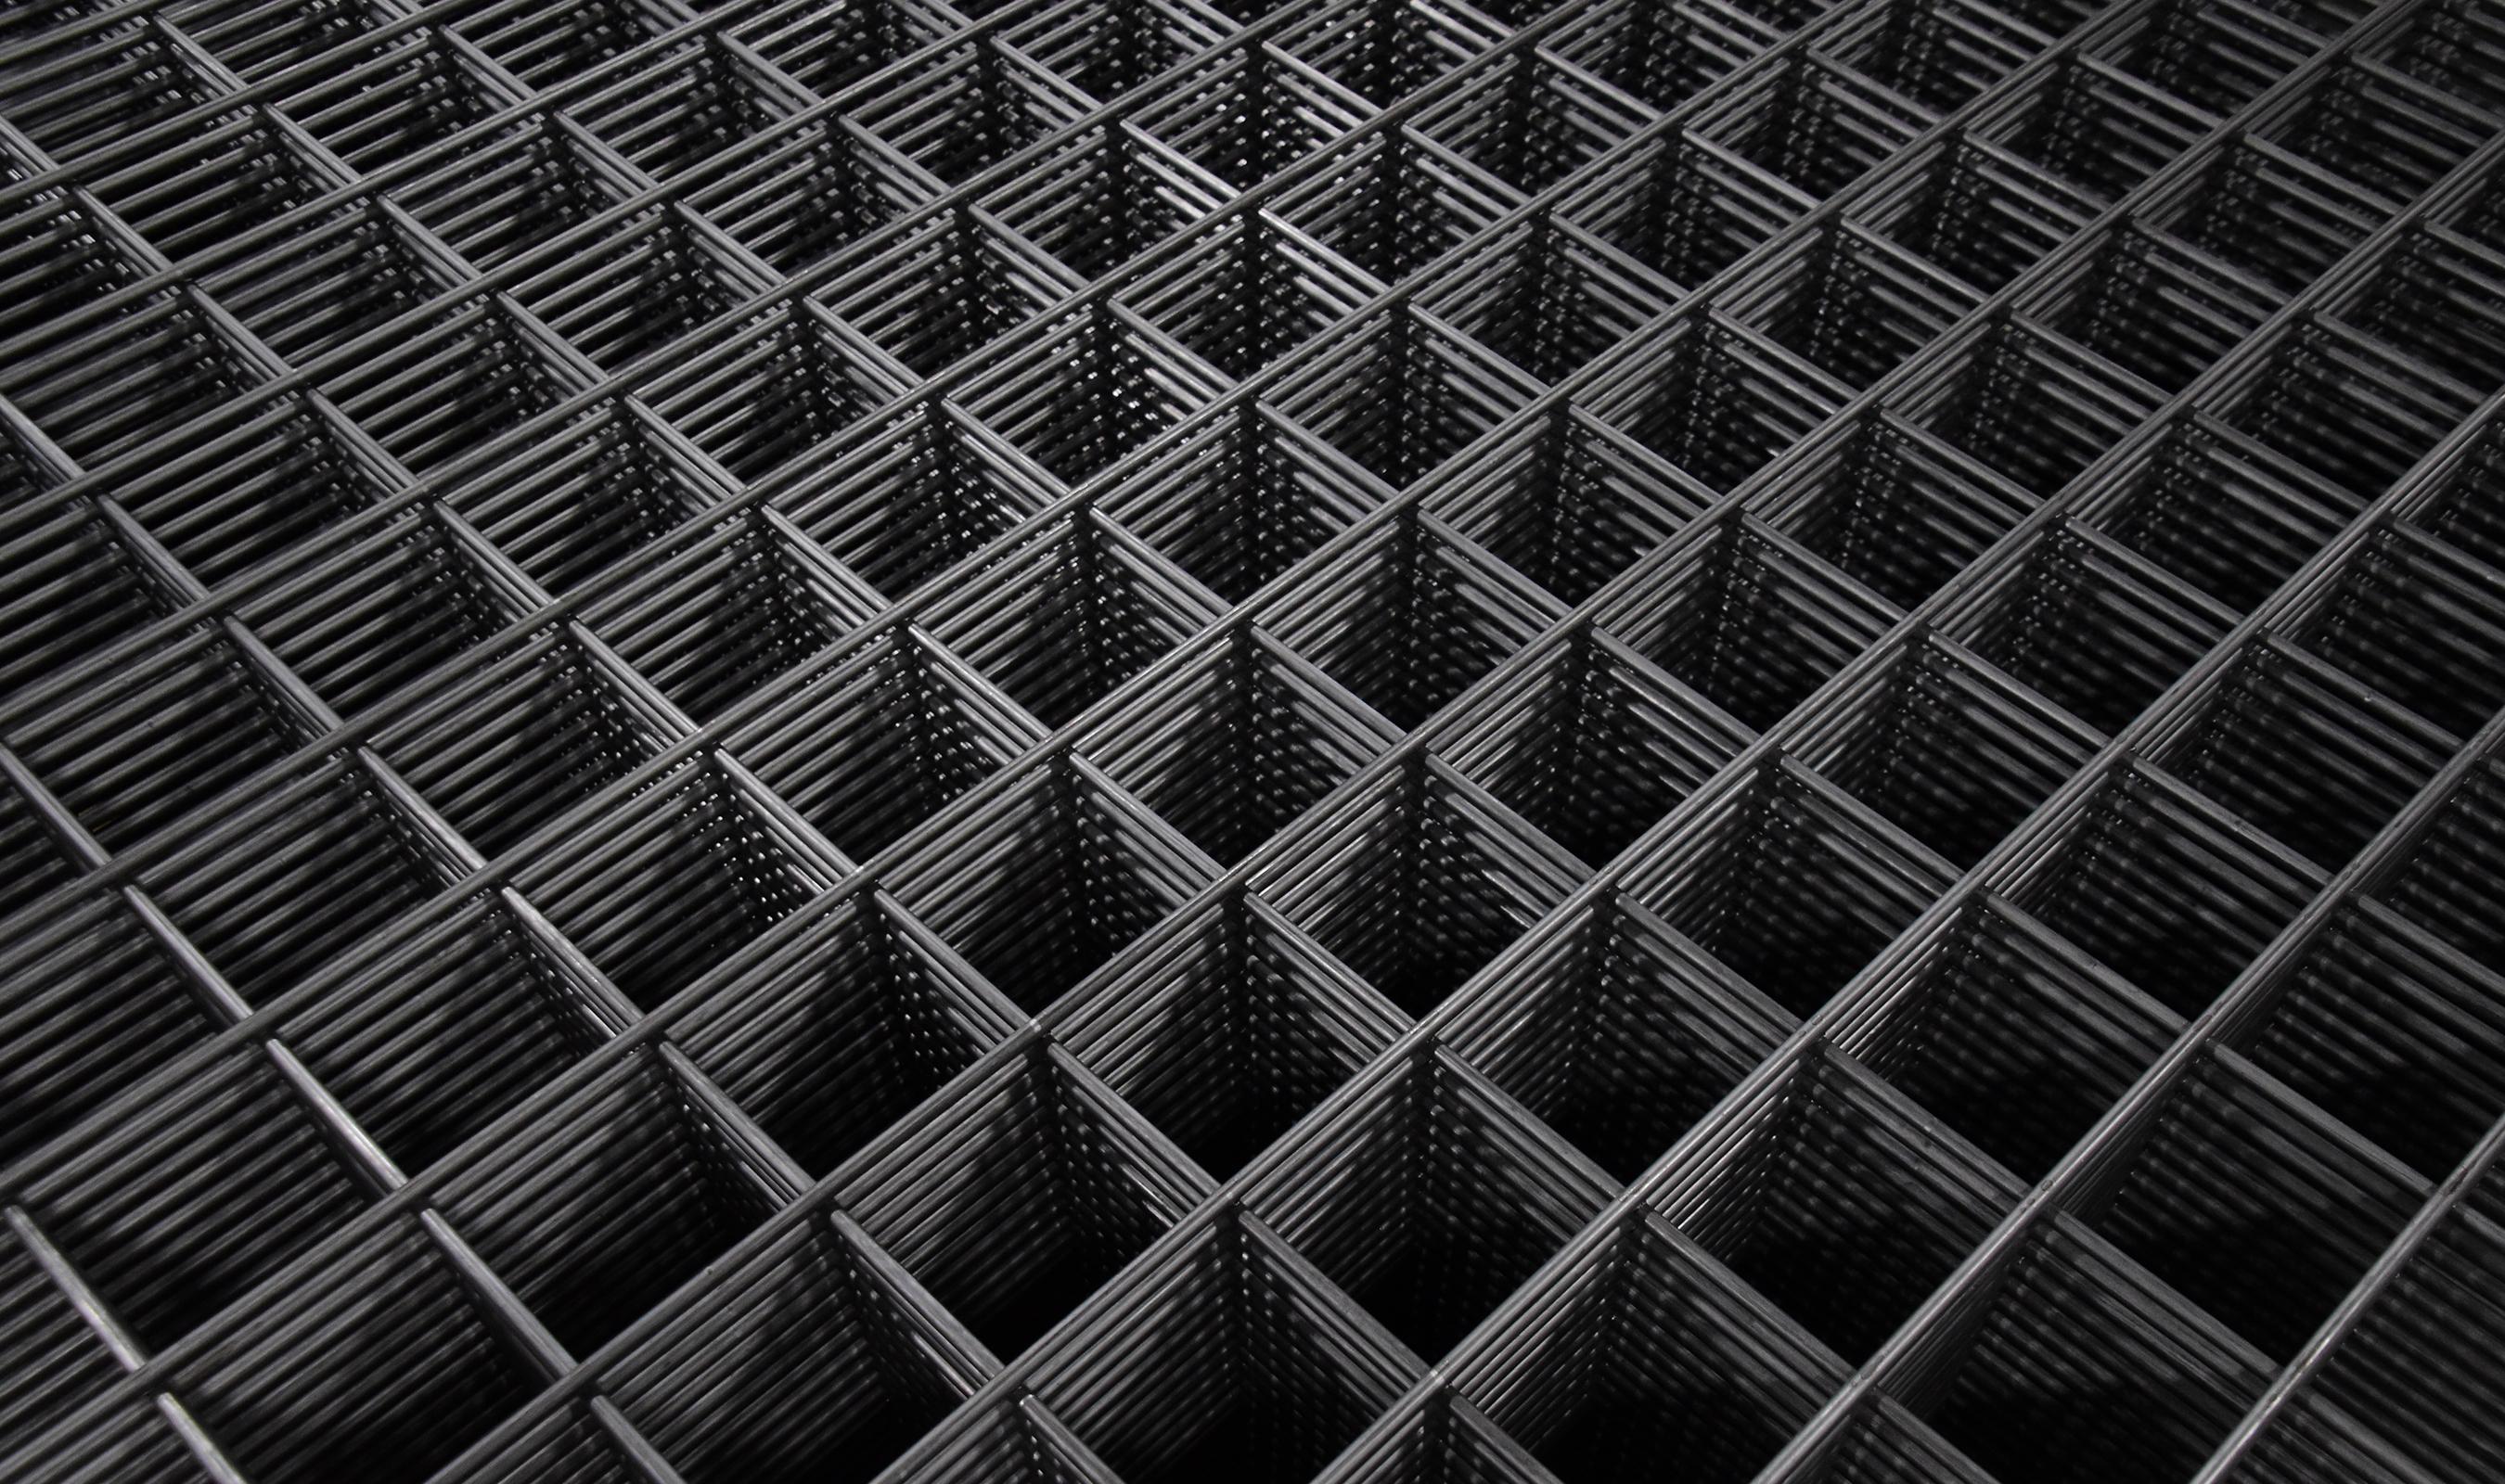 WD-006 welded wire mesh